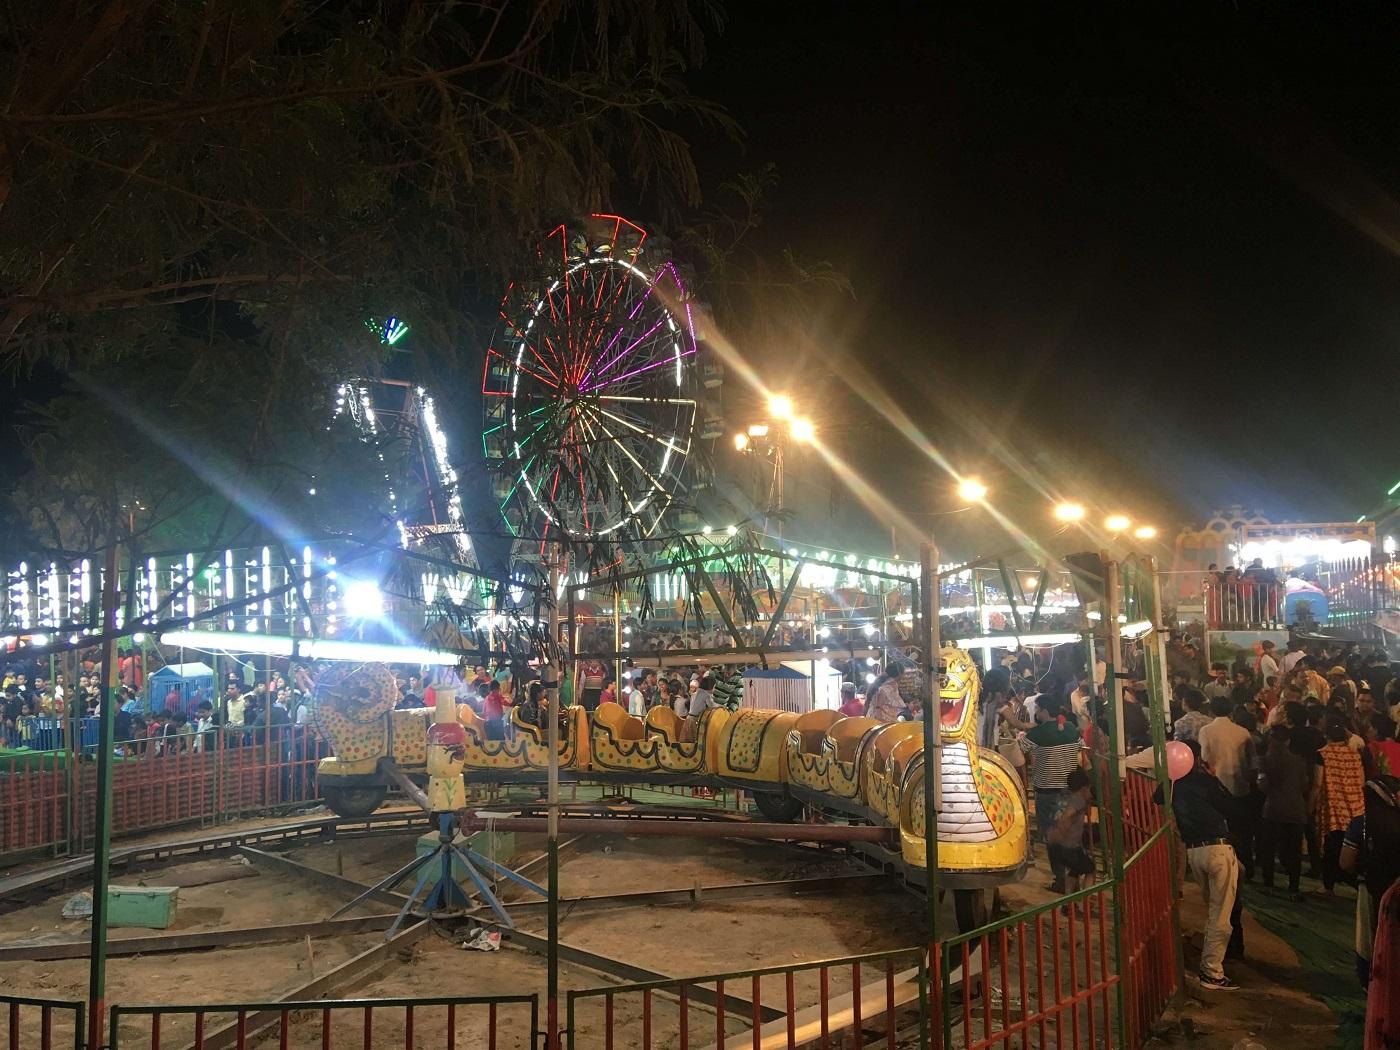 Top Festival Celebrated In Uttar Pradesh-Taj Mahotsav